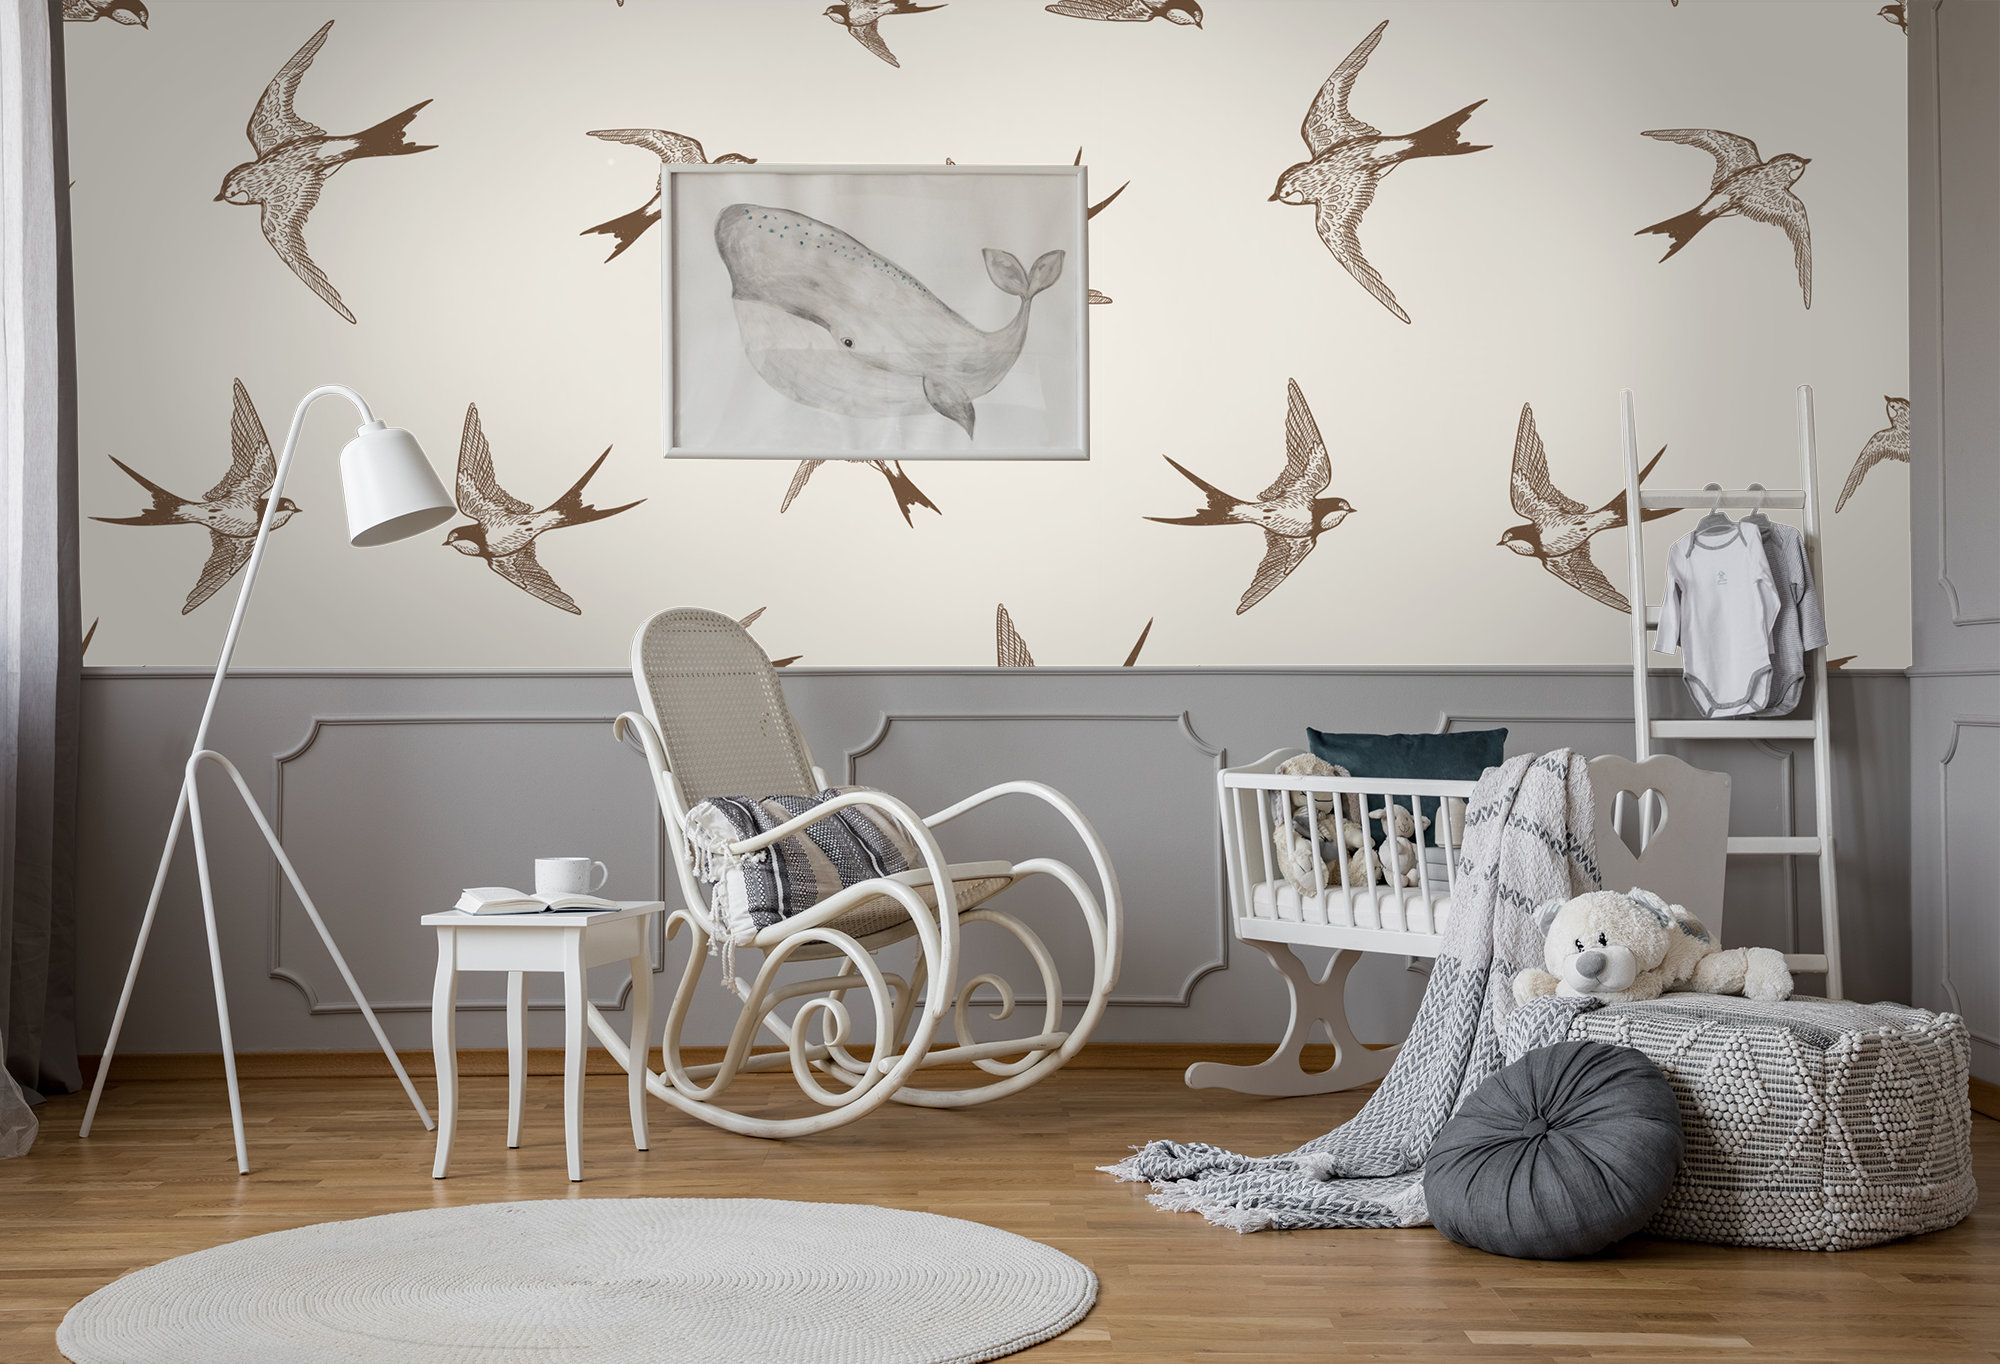 Flying Swallows Self Adhesive Wallpaper Hand Drawn Vintage Etsy Self Adhesive Wallpaper Removable Wall Murals Removable Wall